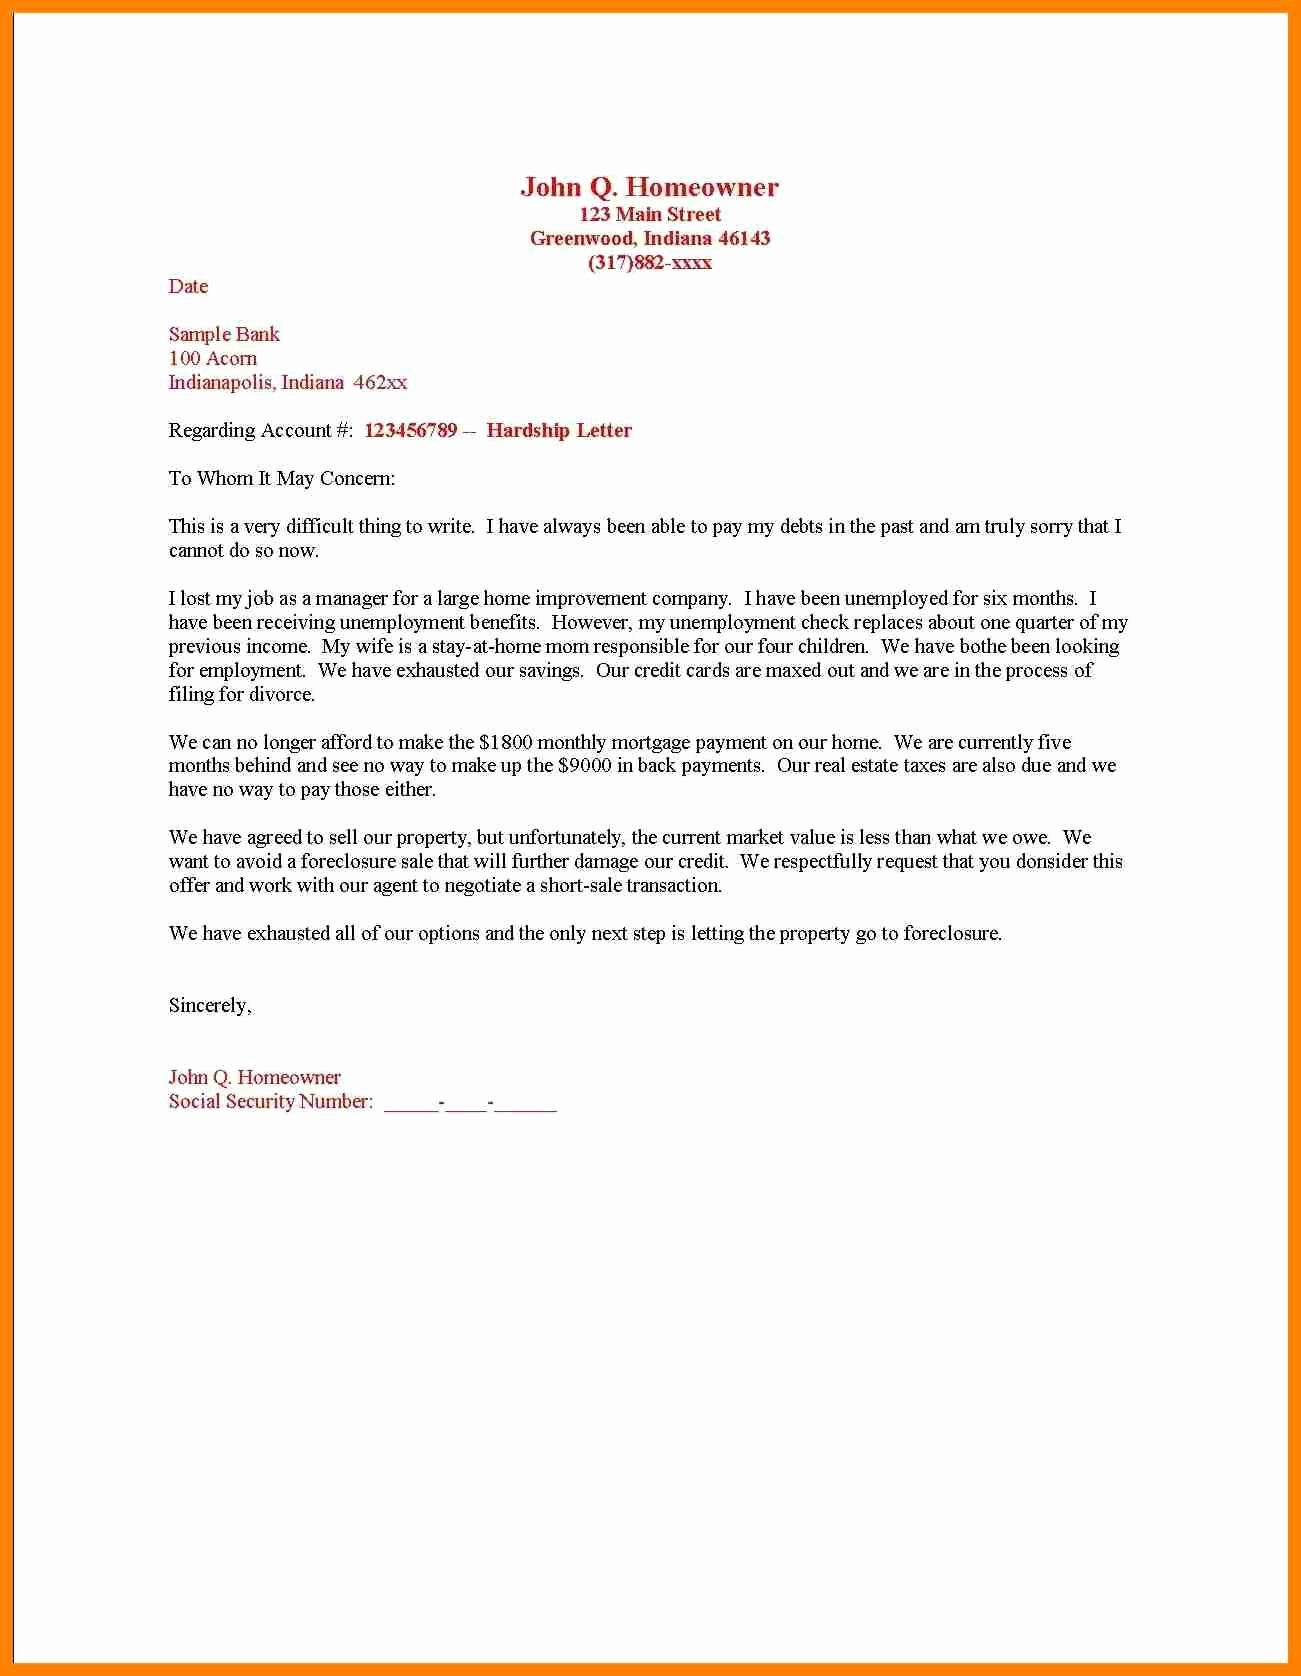 Short Sale Hardship Letter Template - Sample Hardship Letter Medical Bills New Free Sample Hardship Letter